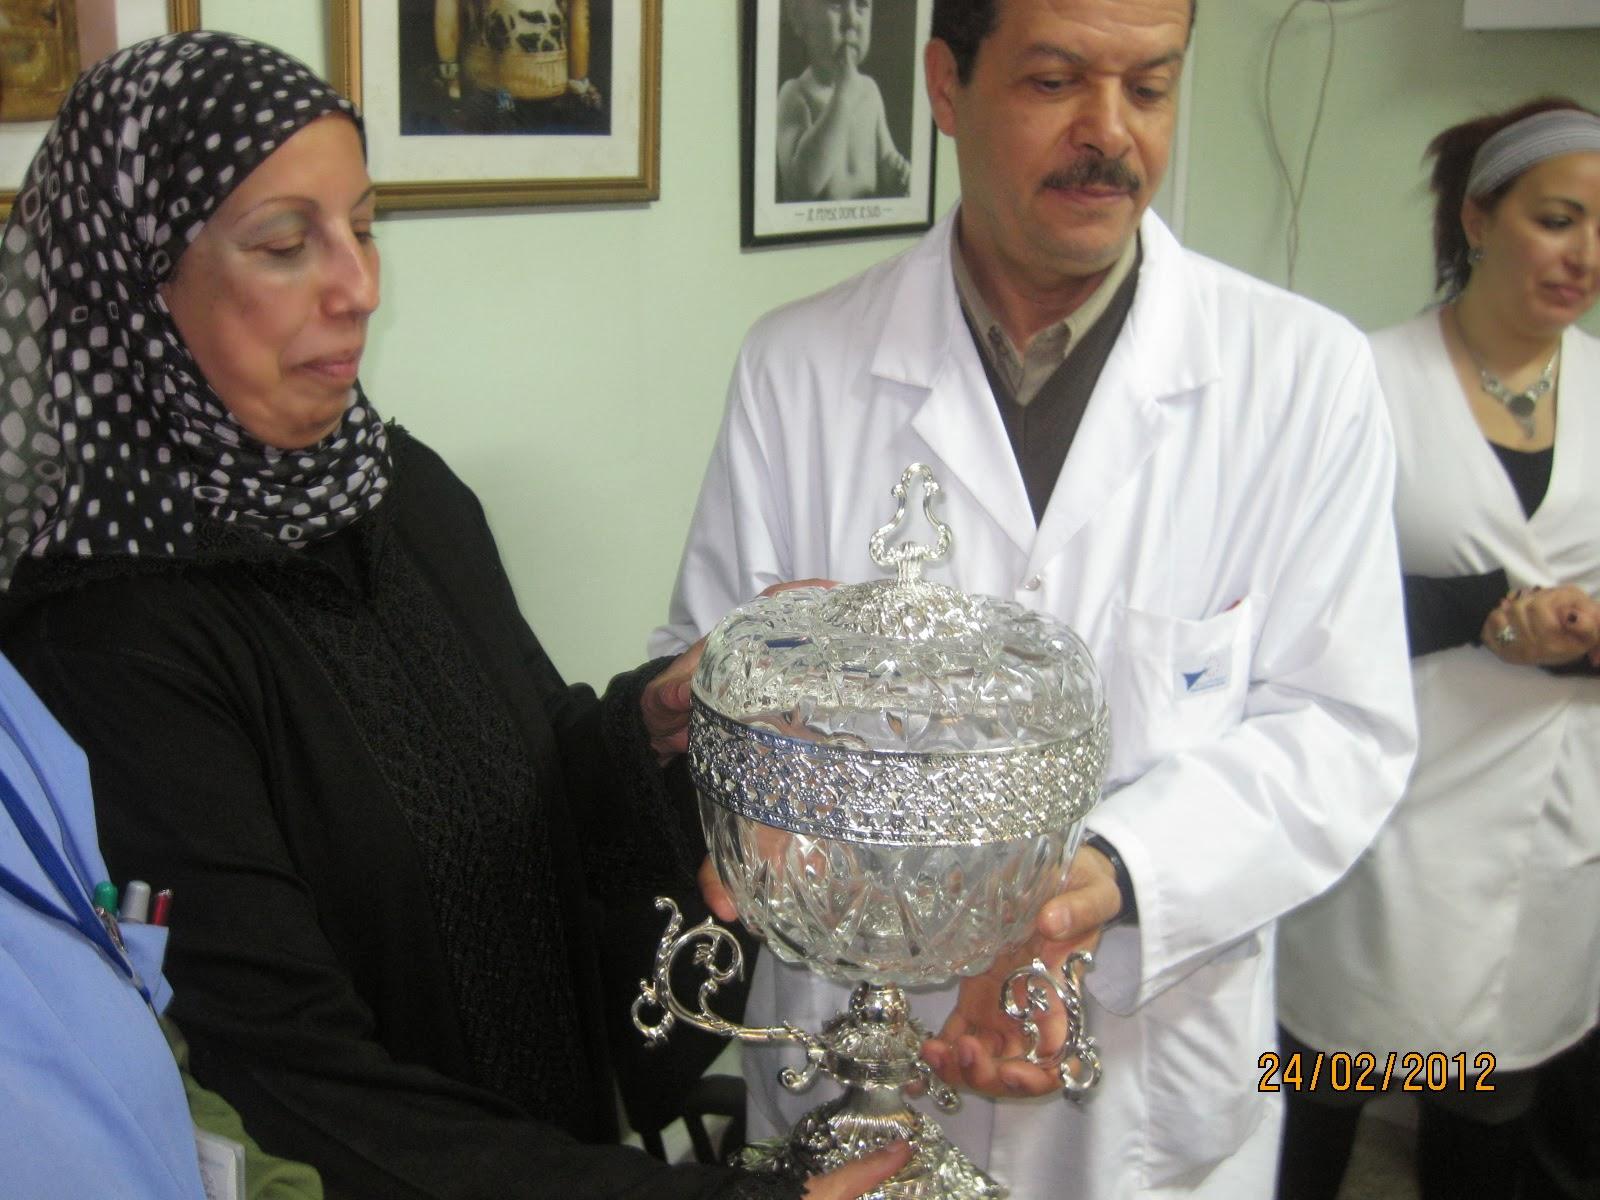 TAKRIME LES INFIRMIERS RETRAITES DU BLOC OPERATOIRE HOPITAL IBNO SINA RABAT